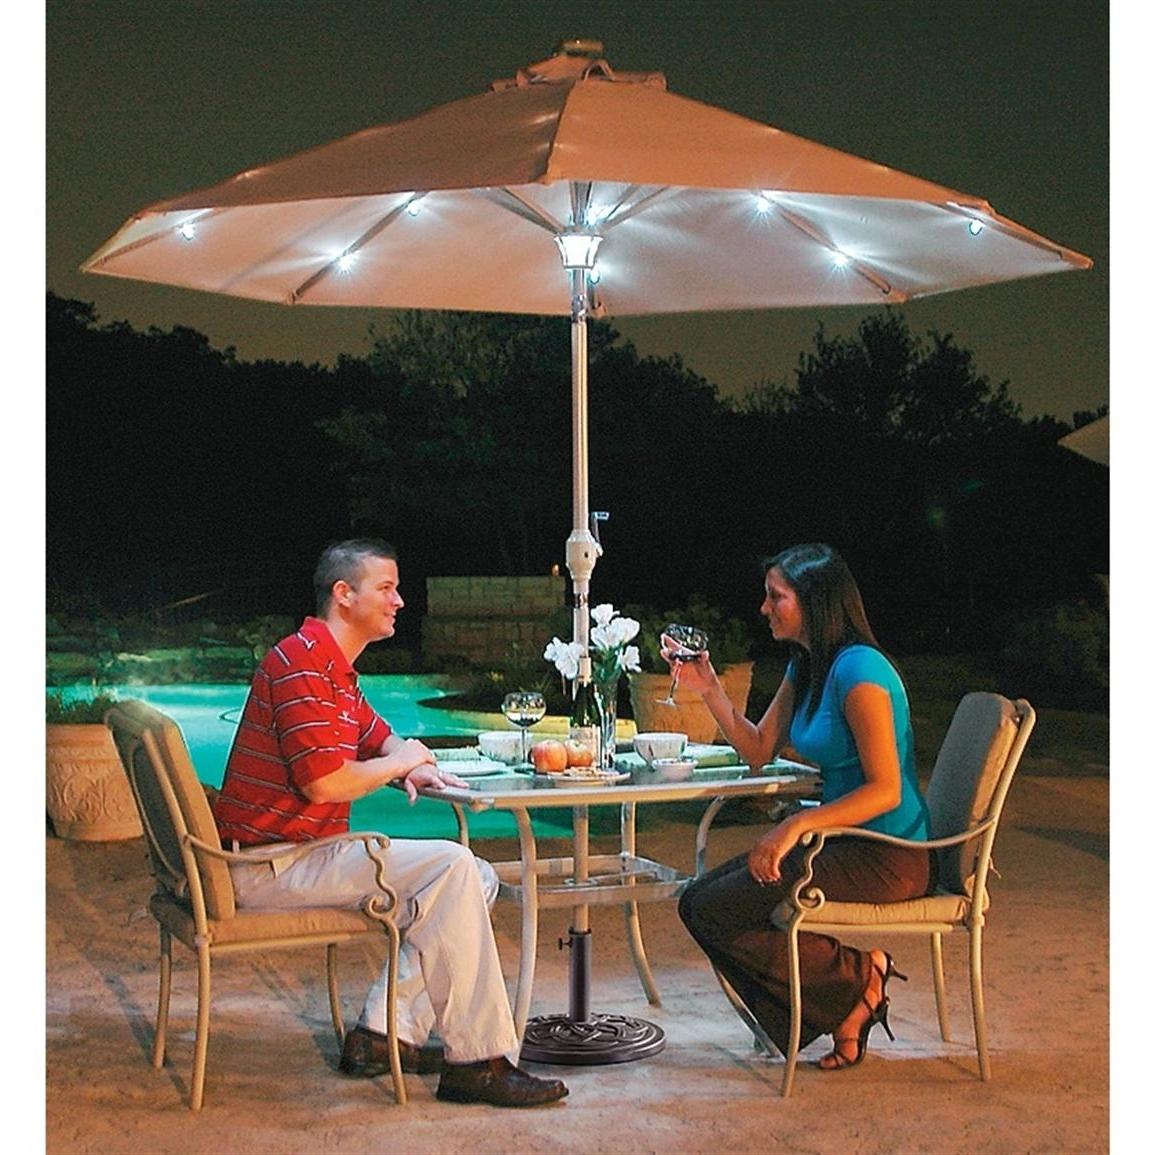 2019 Patio Umbrellas With Solar Lights Design Ideas : Best Photos Of With Regard To Sunbrella Patio Umbrellas With Solar Lights (Gallery 5 of 20)